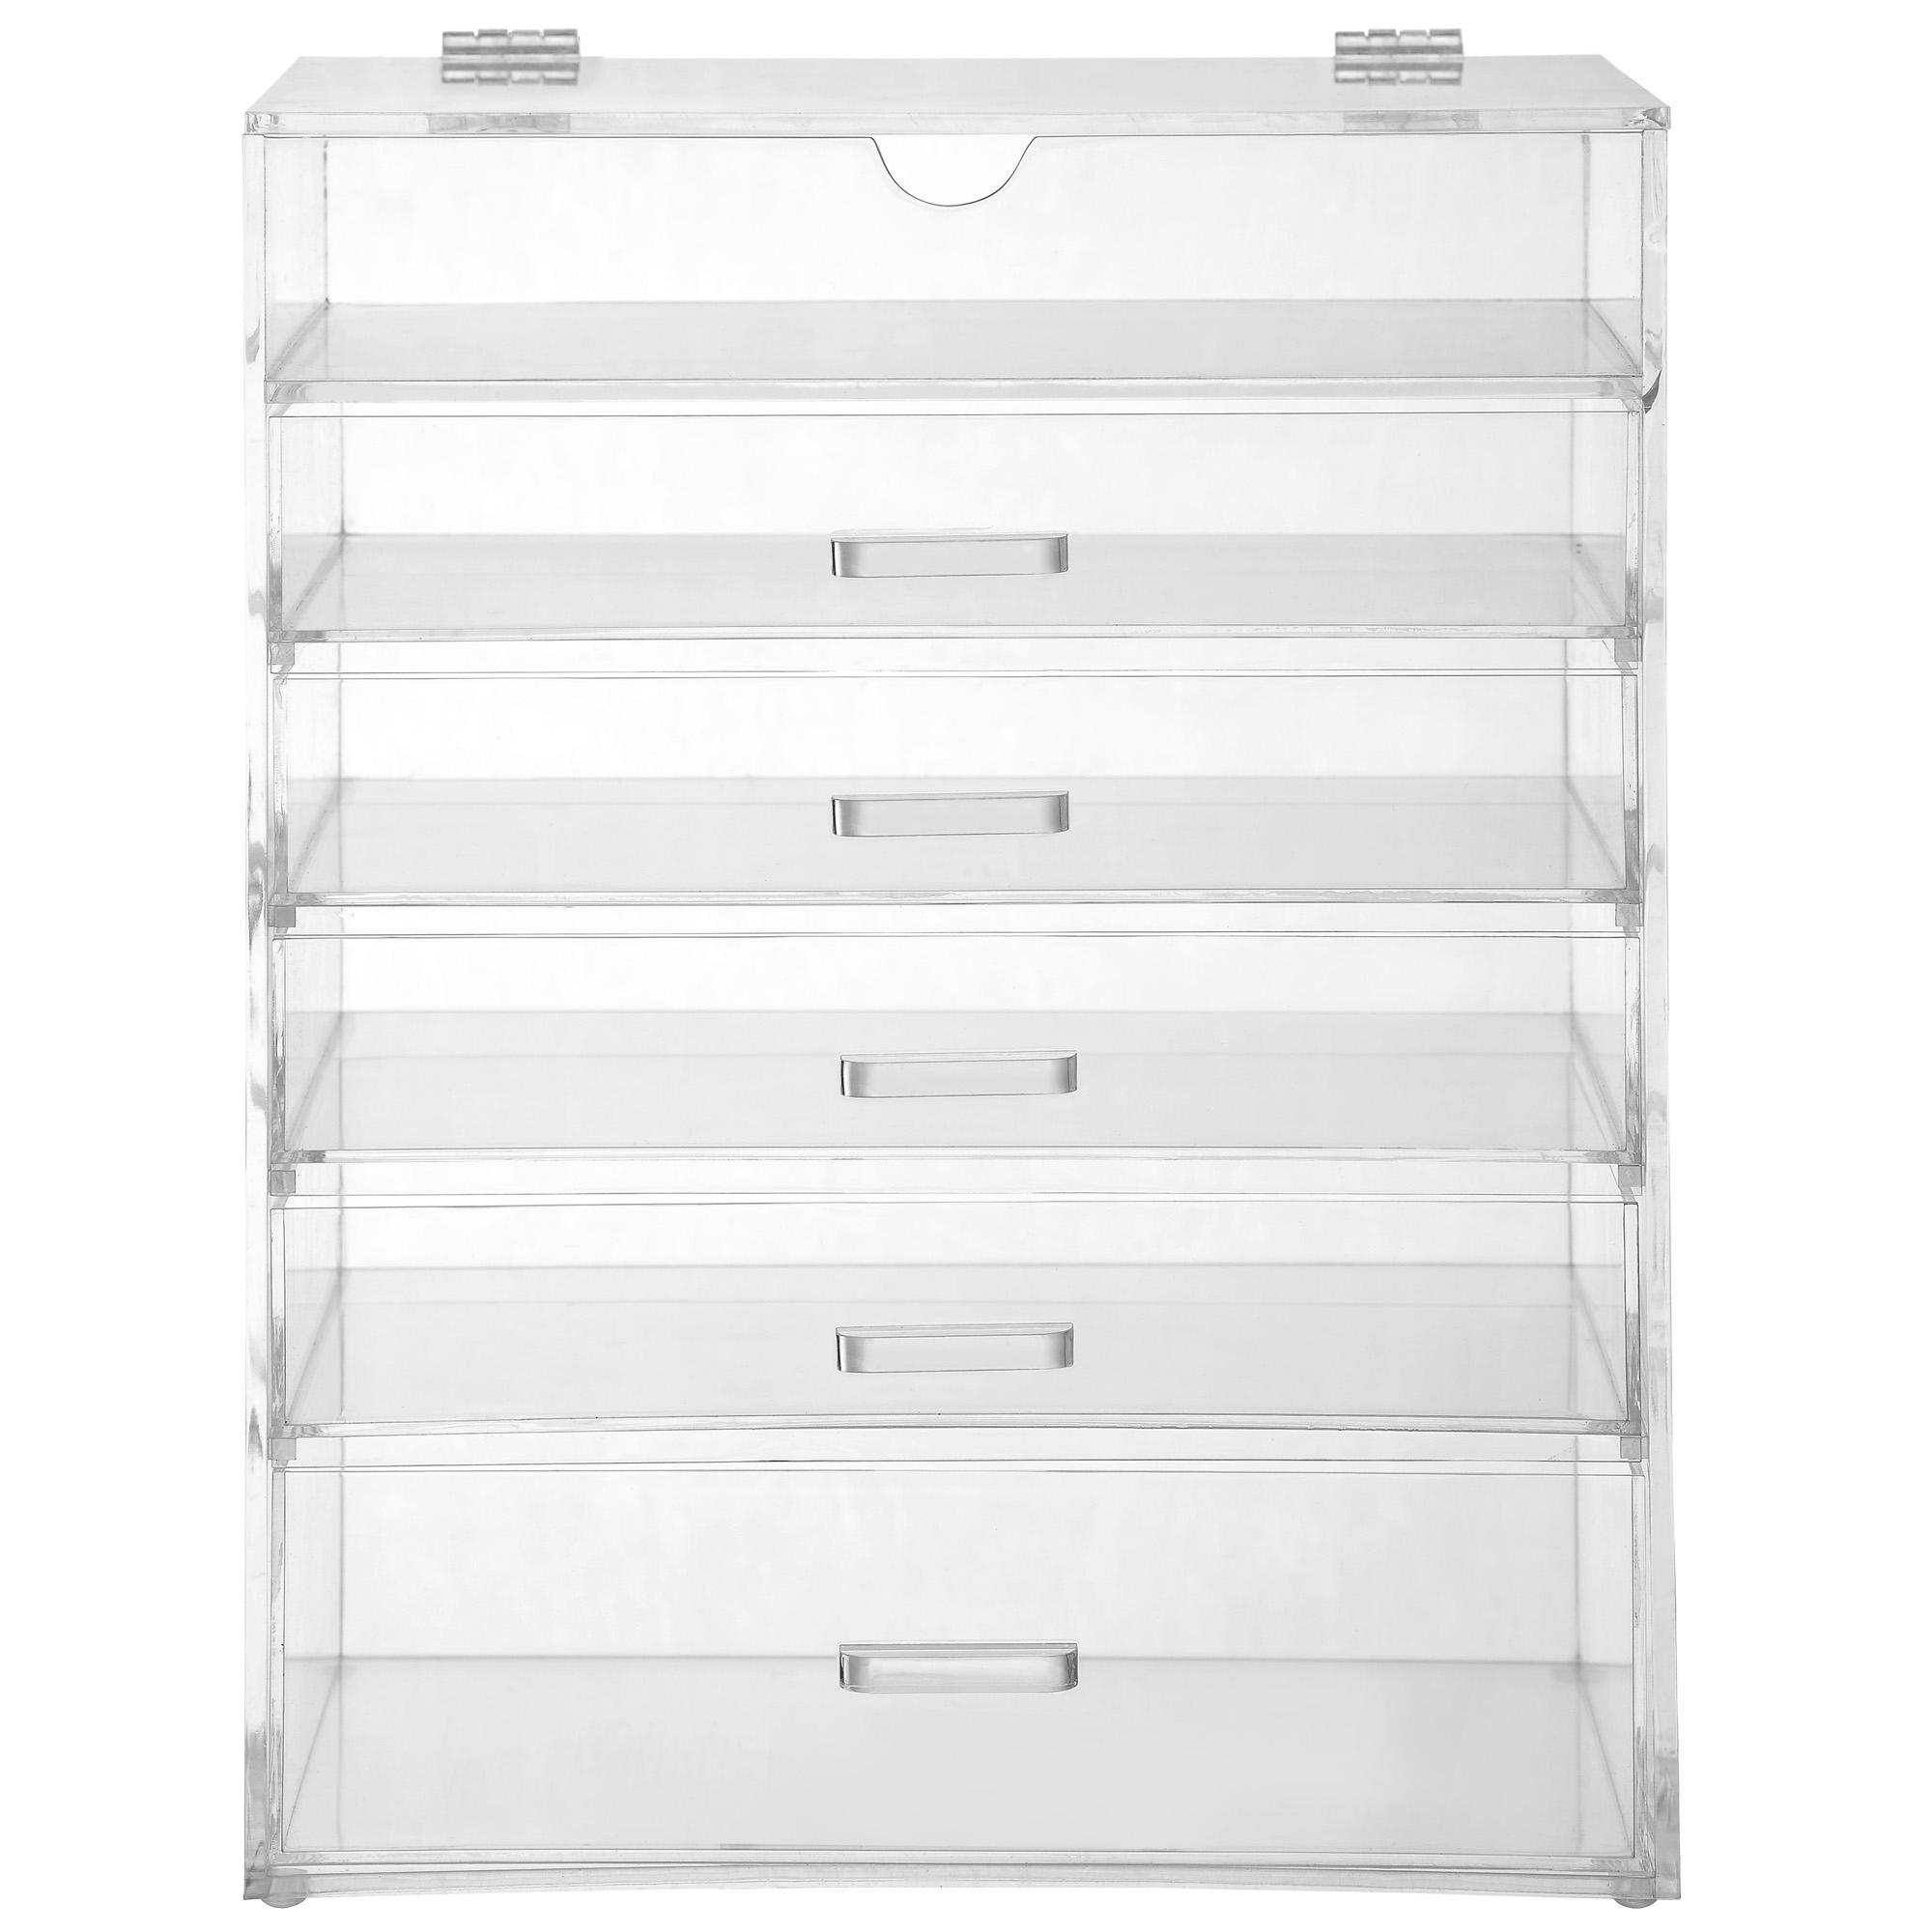 drawer en bedroom chest catalog cm of storage white large koppang ikea drawers